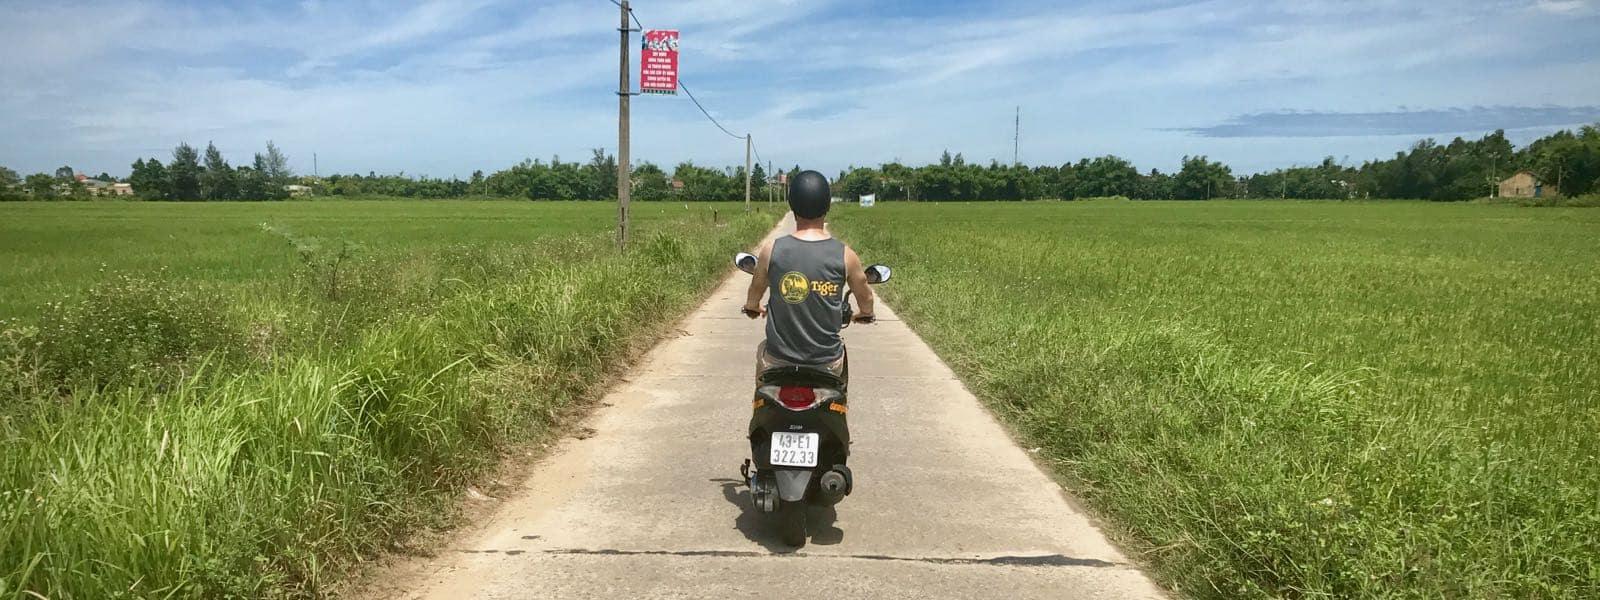 Week Twnty Four Phil betternotstop scooter fun Vietnam